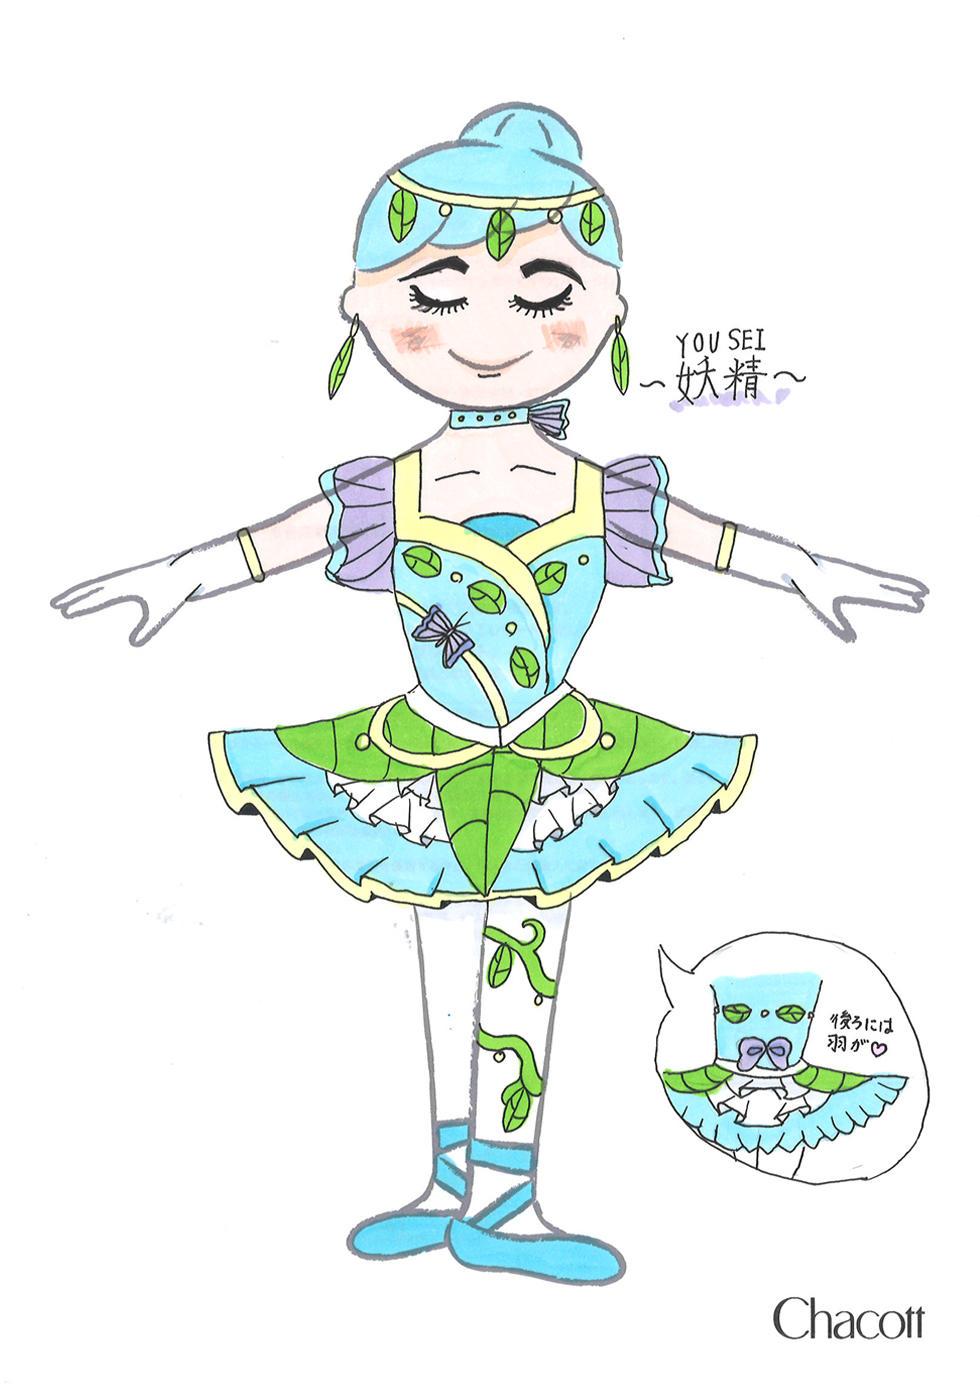 shinsaibashi_costume_design_2020_4.jpg